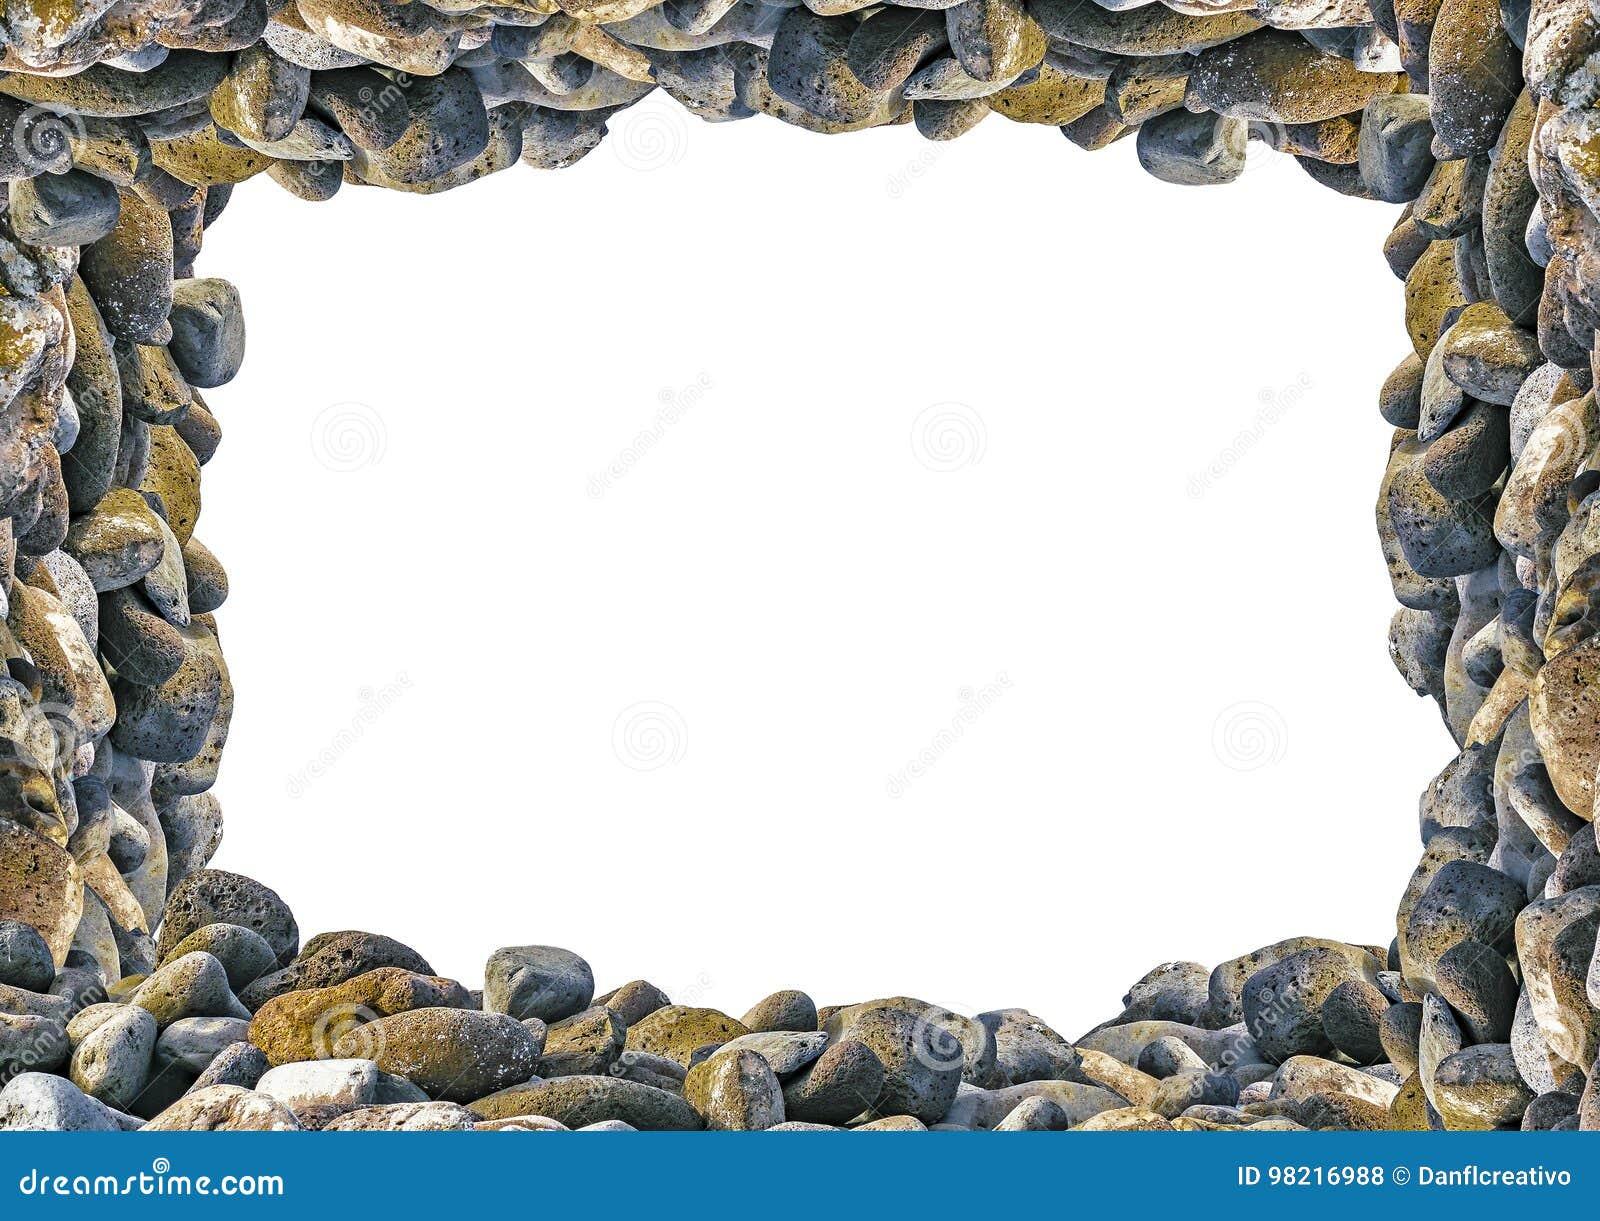 Landscape Frame With Rocks Borders Stock Photo - Image of invitation ...